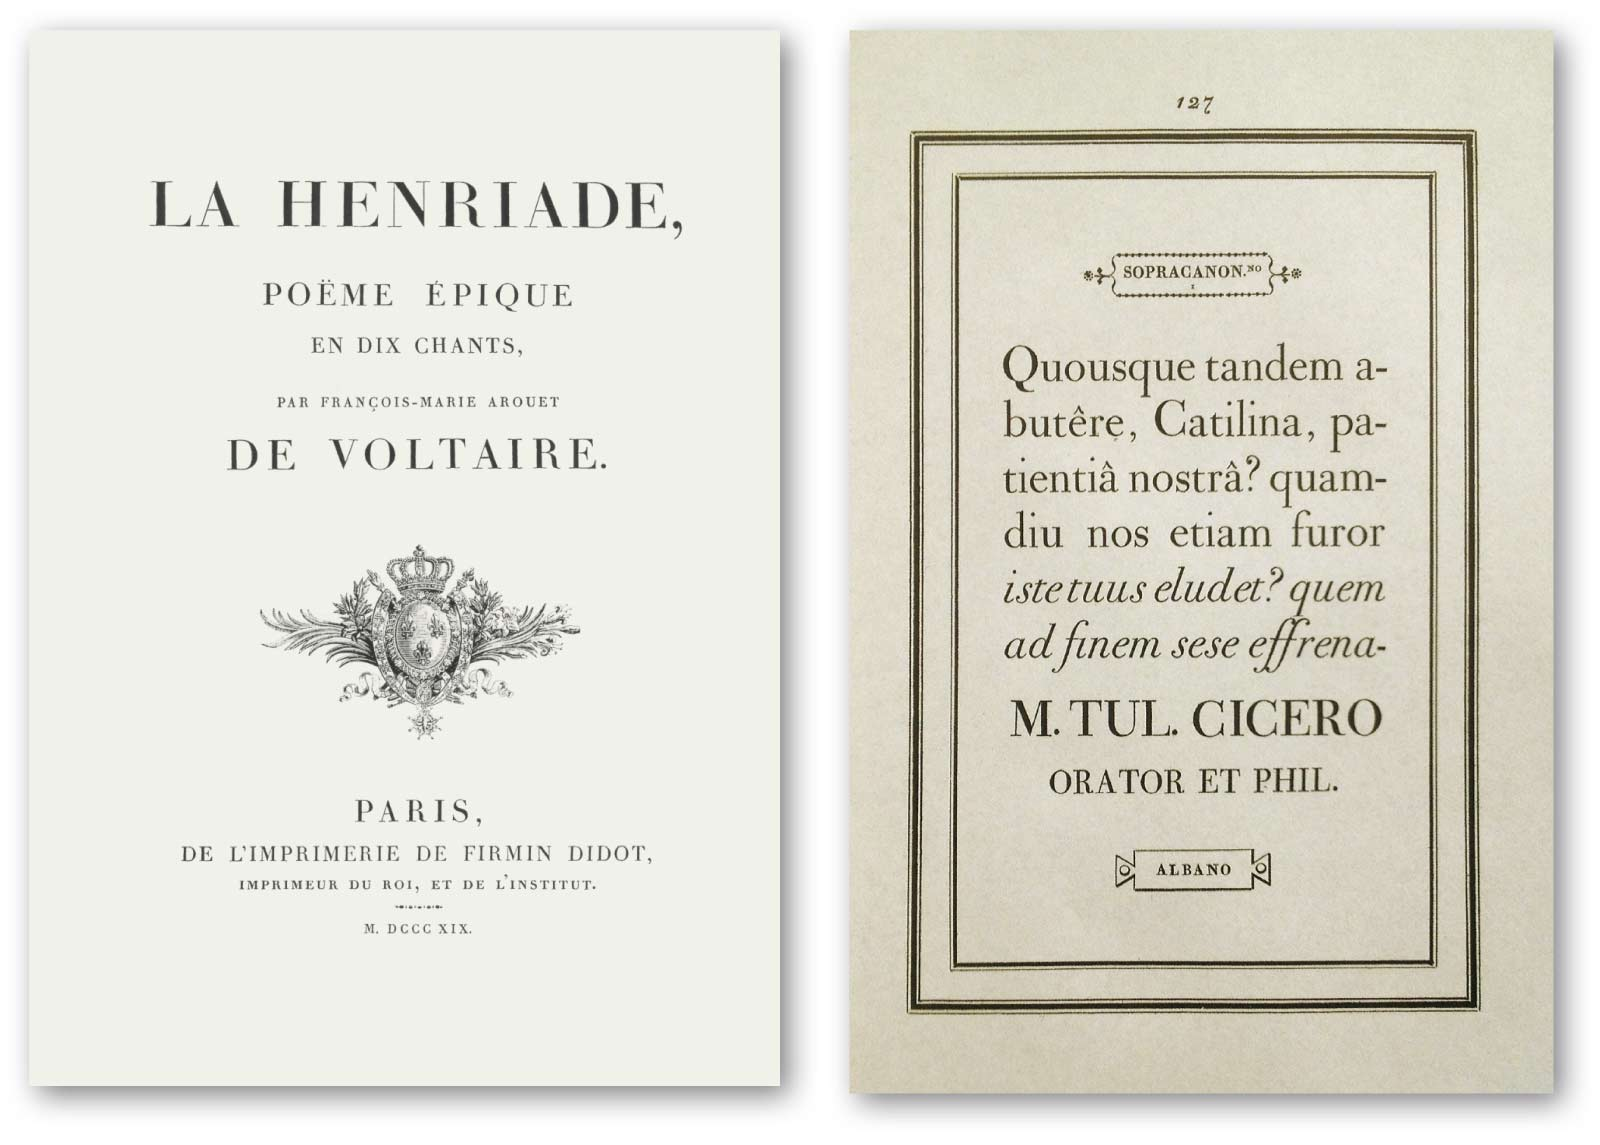 [19] Didot 1819 and Bodoni 1818